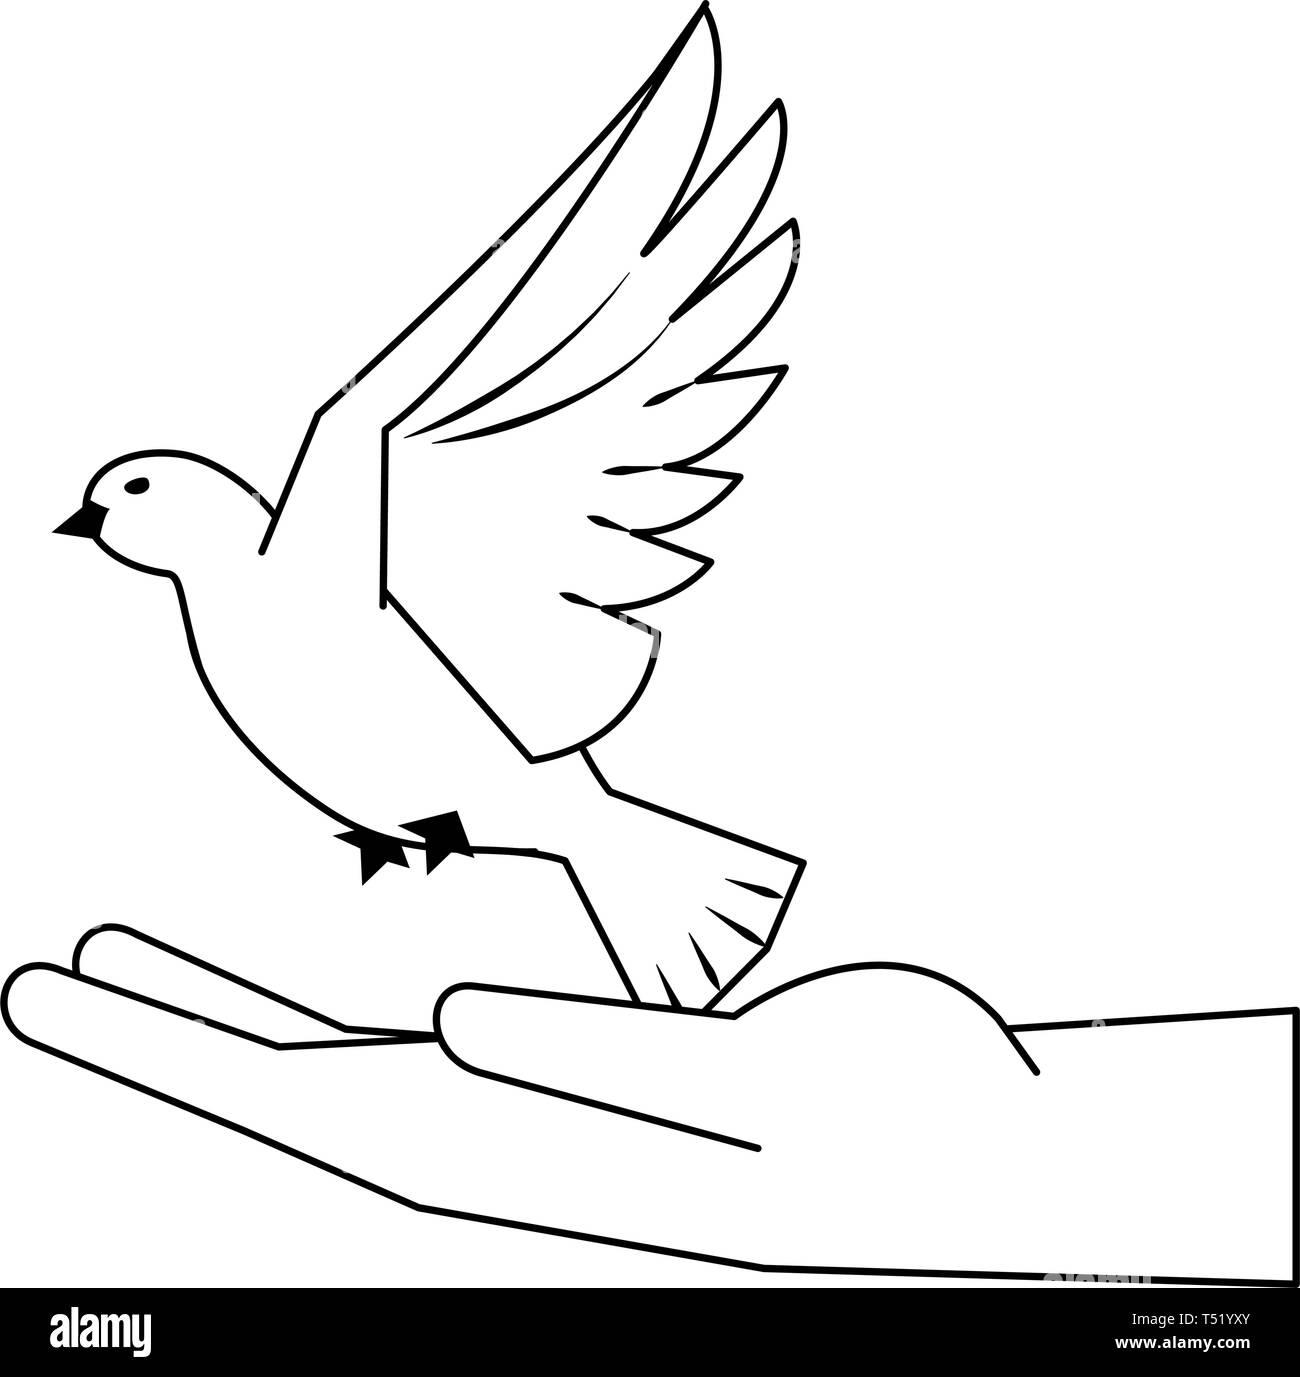 Flying bird cartoon black and white - photo#53